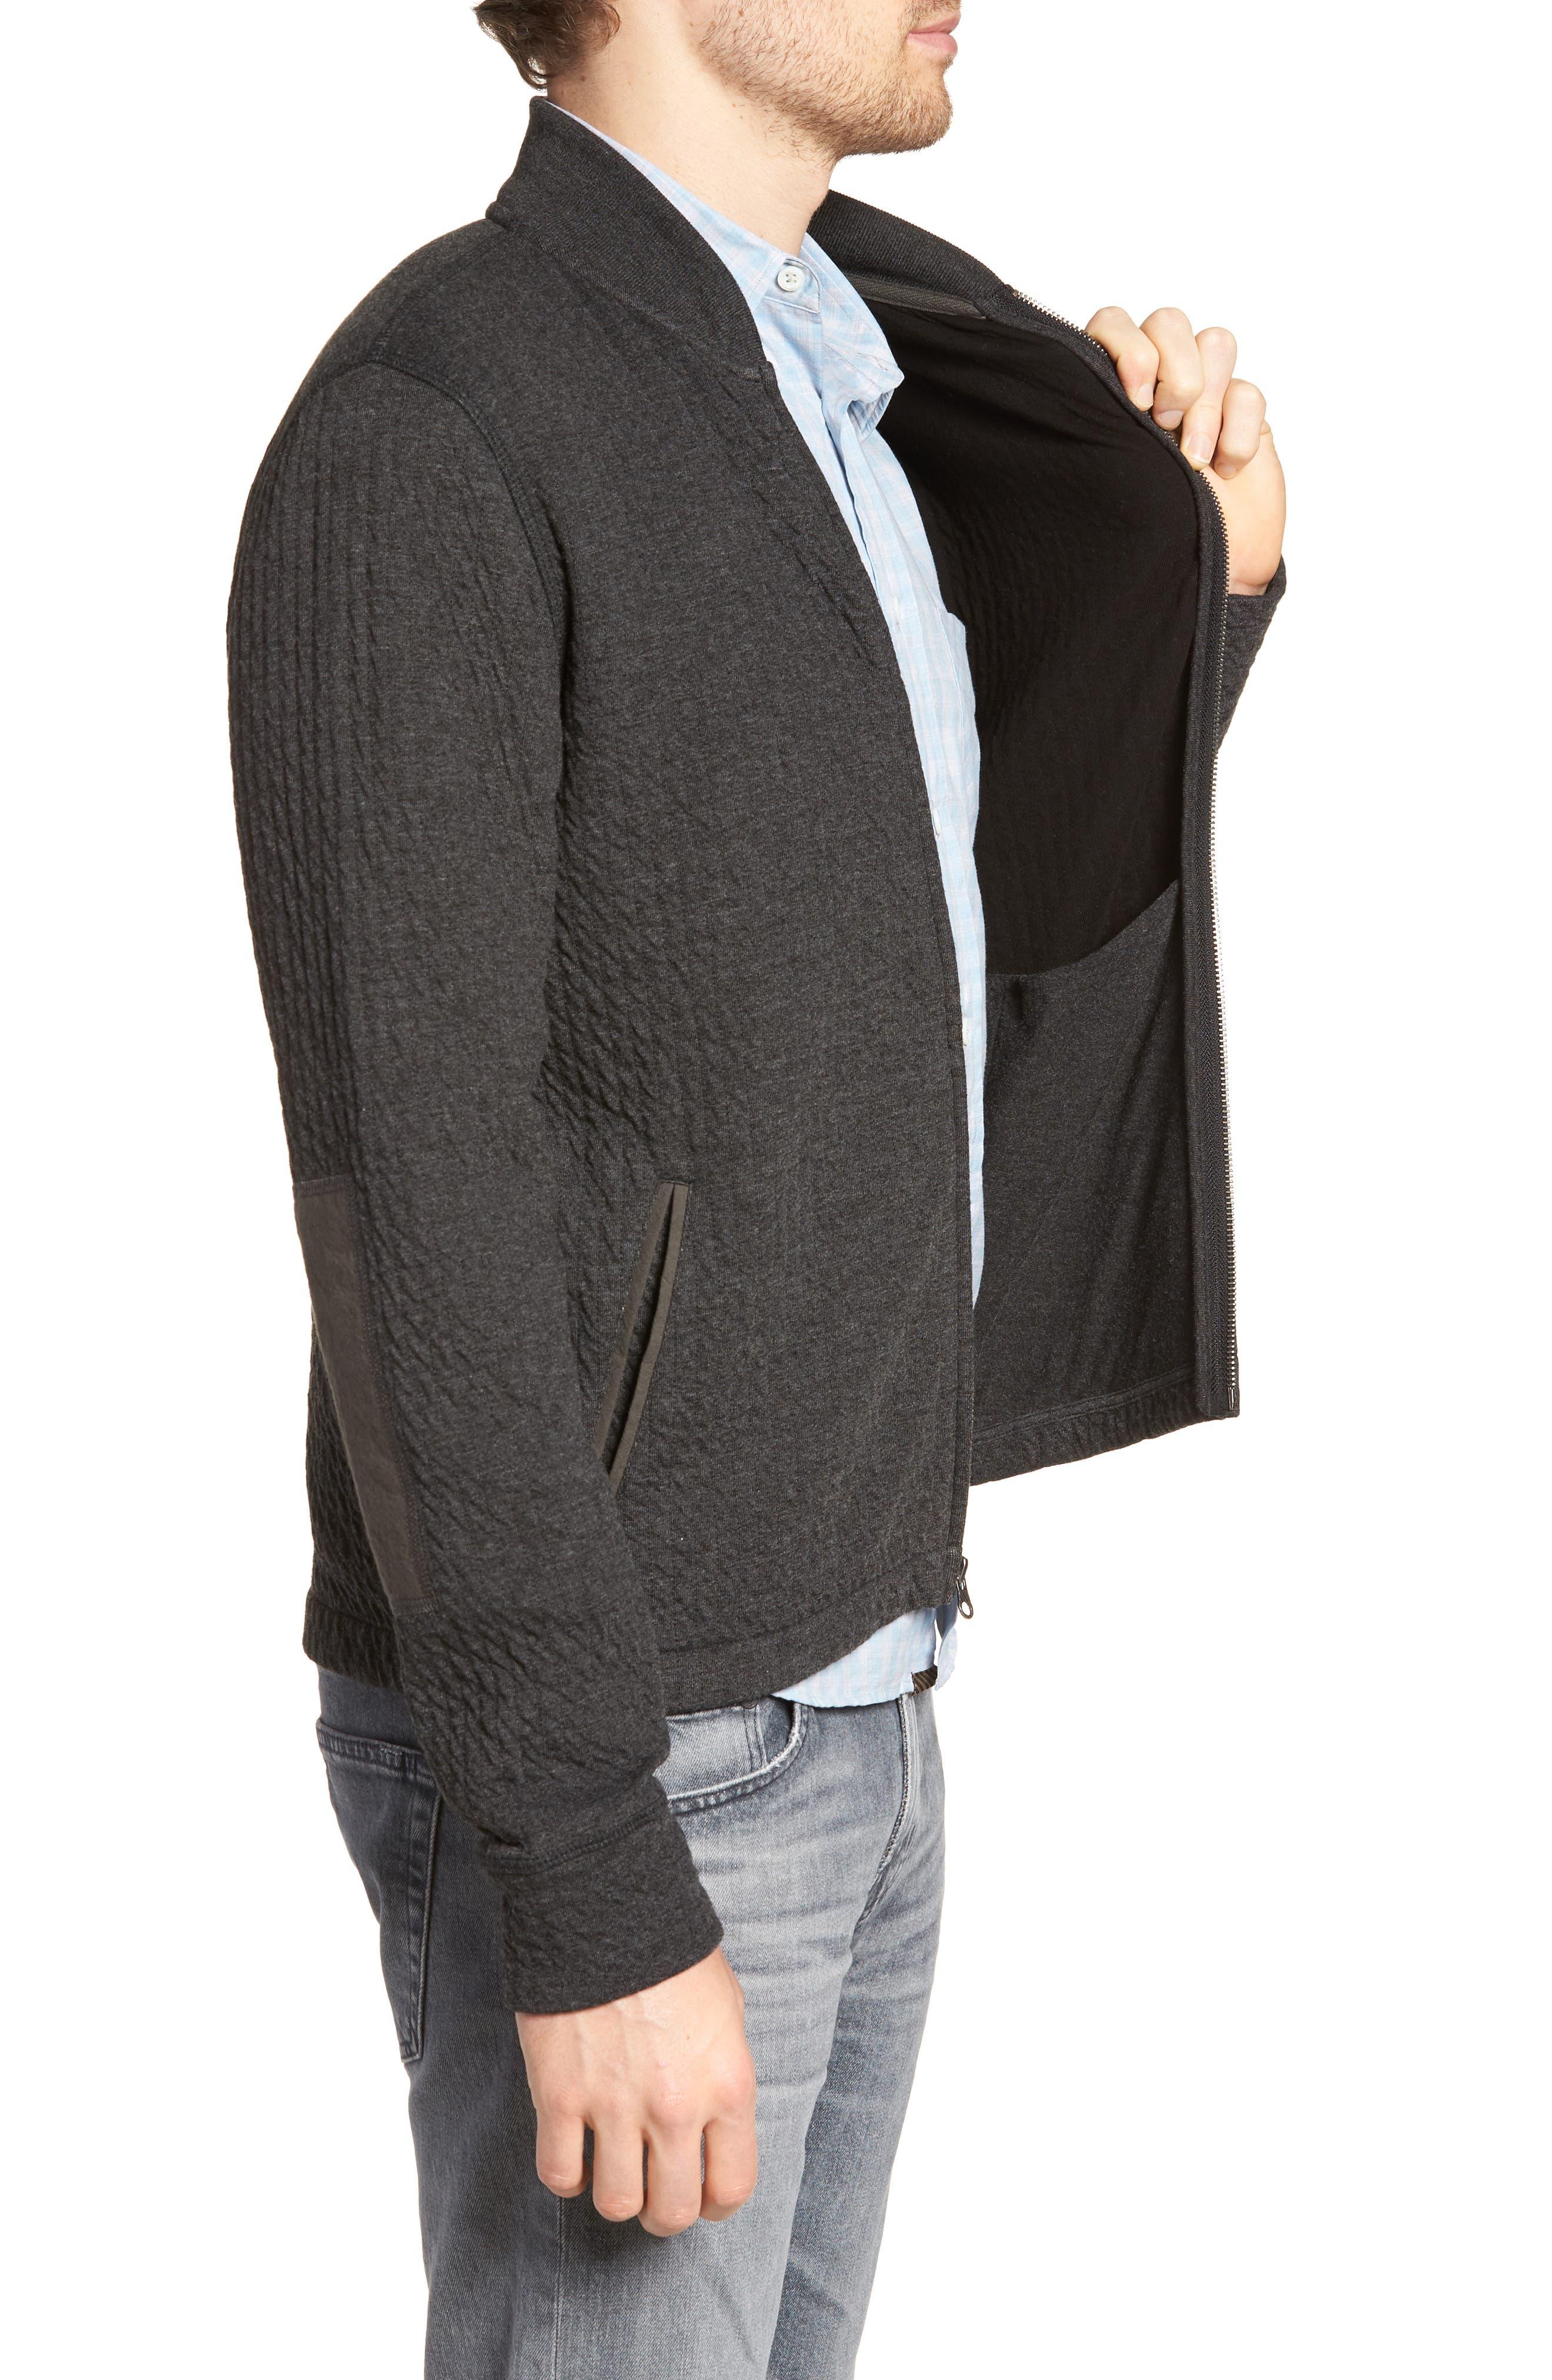 Giles Slim Fit Zip-Up Sweatshirt,                             Alternate thumbnail 3, color,                             402